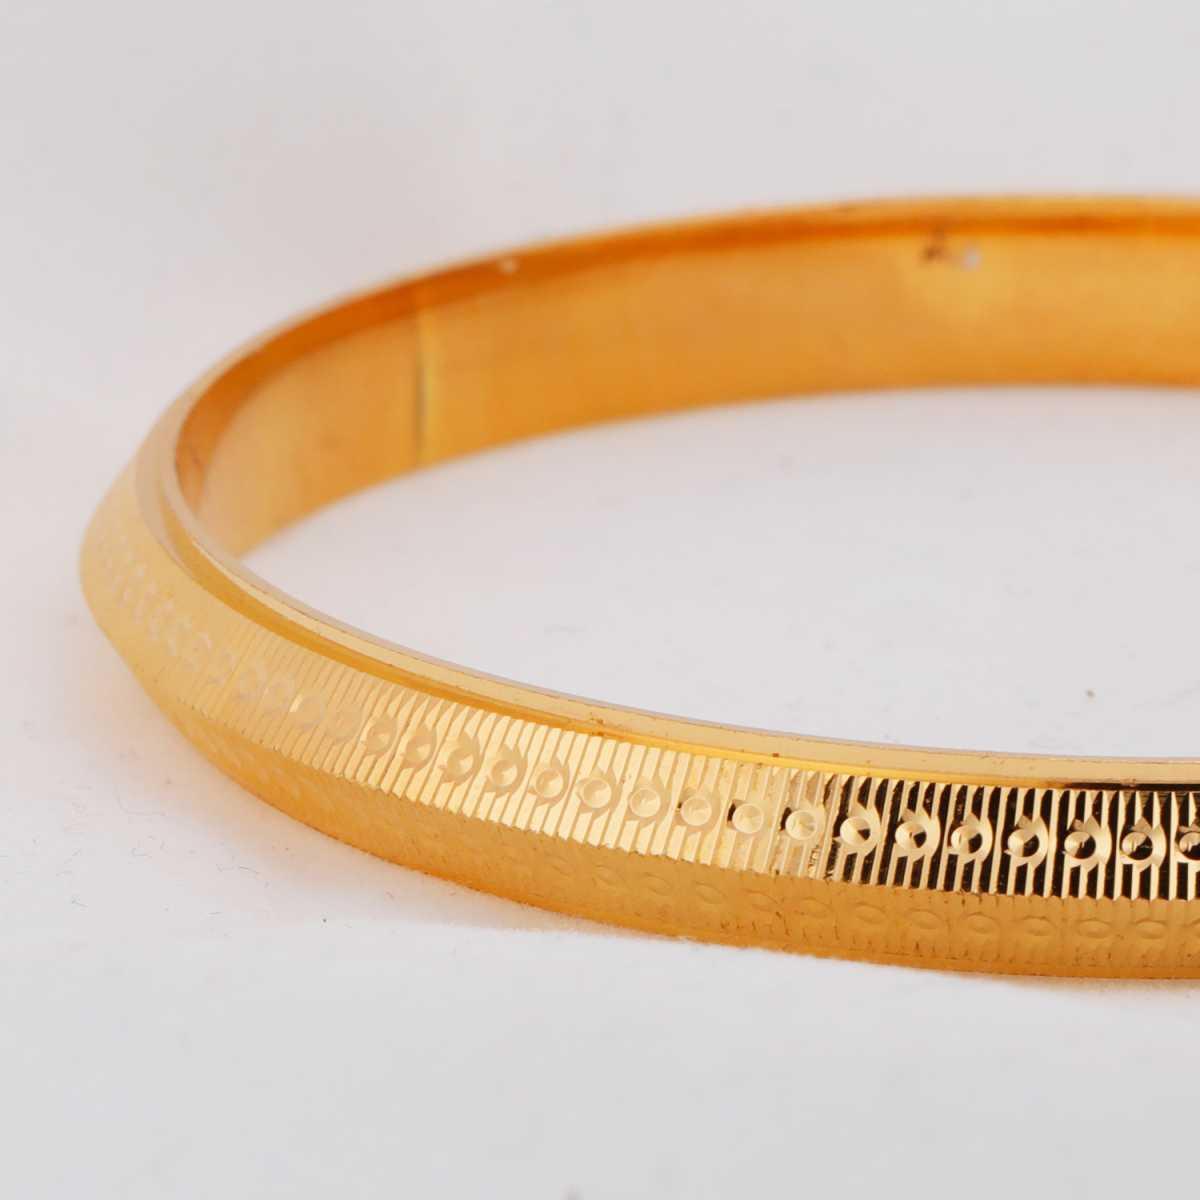 Silver Shine Gold Plated Metal Thick Round Ridged  Punjabi Kada Bangle Bracelet For Boys and Mens.